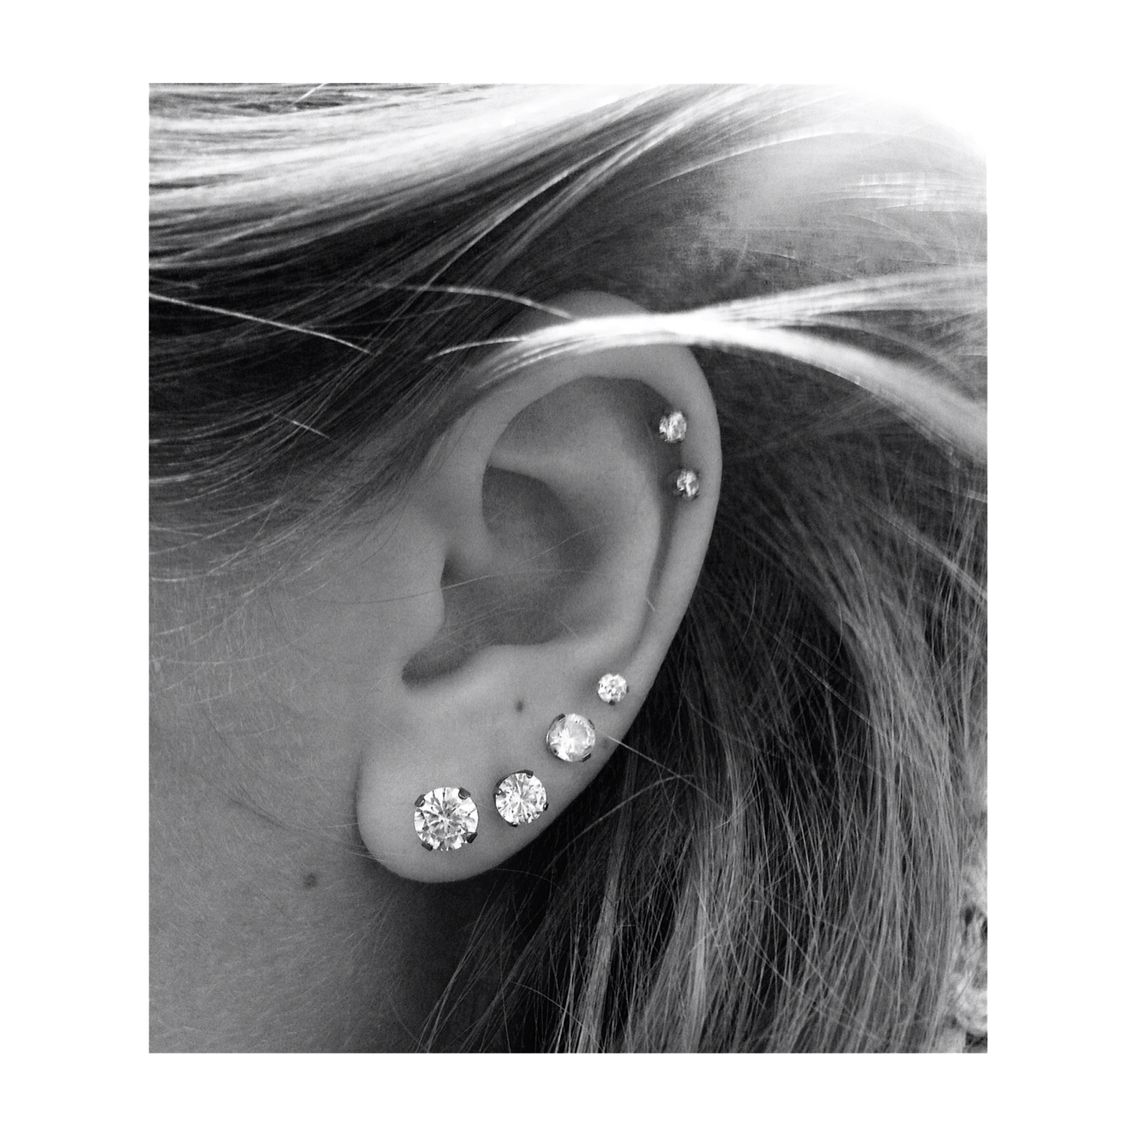 Quadruple Lobe Double Cartilage! I Want This!